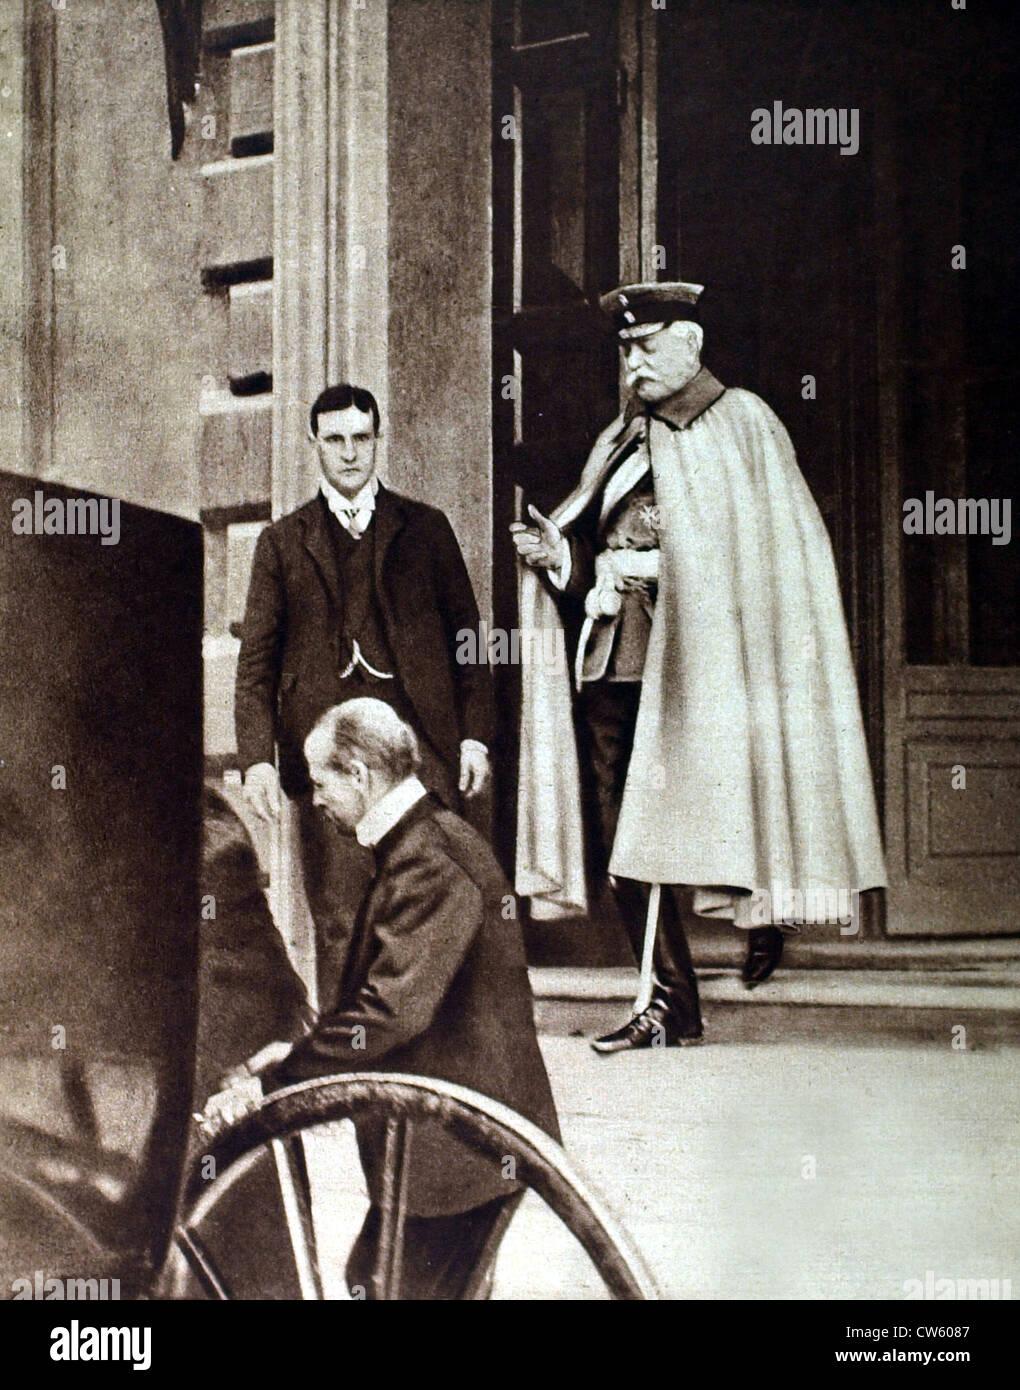 World War I. Prince von Bülow leaving the German embassy in Rome (1915) - Stock Image